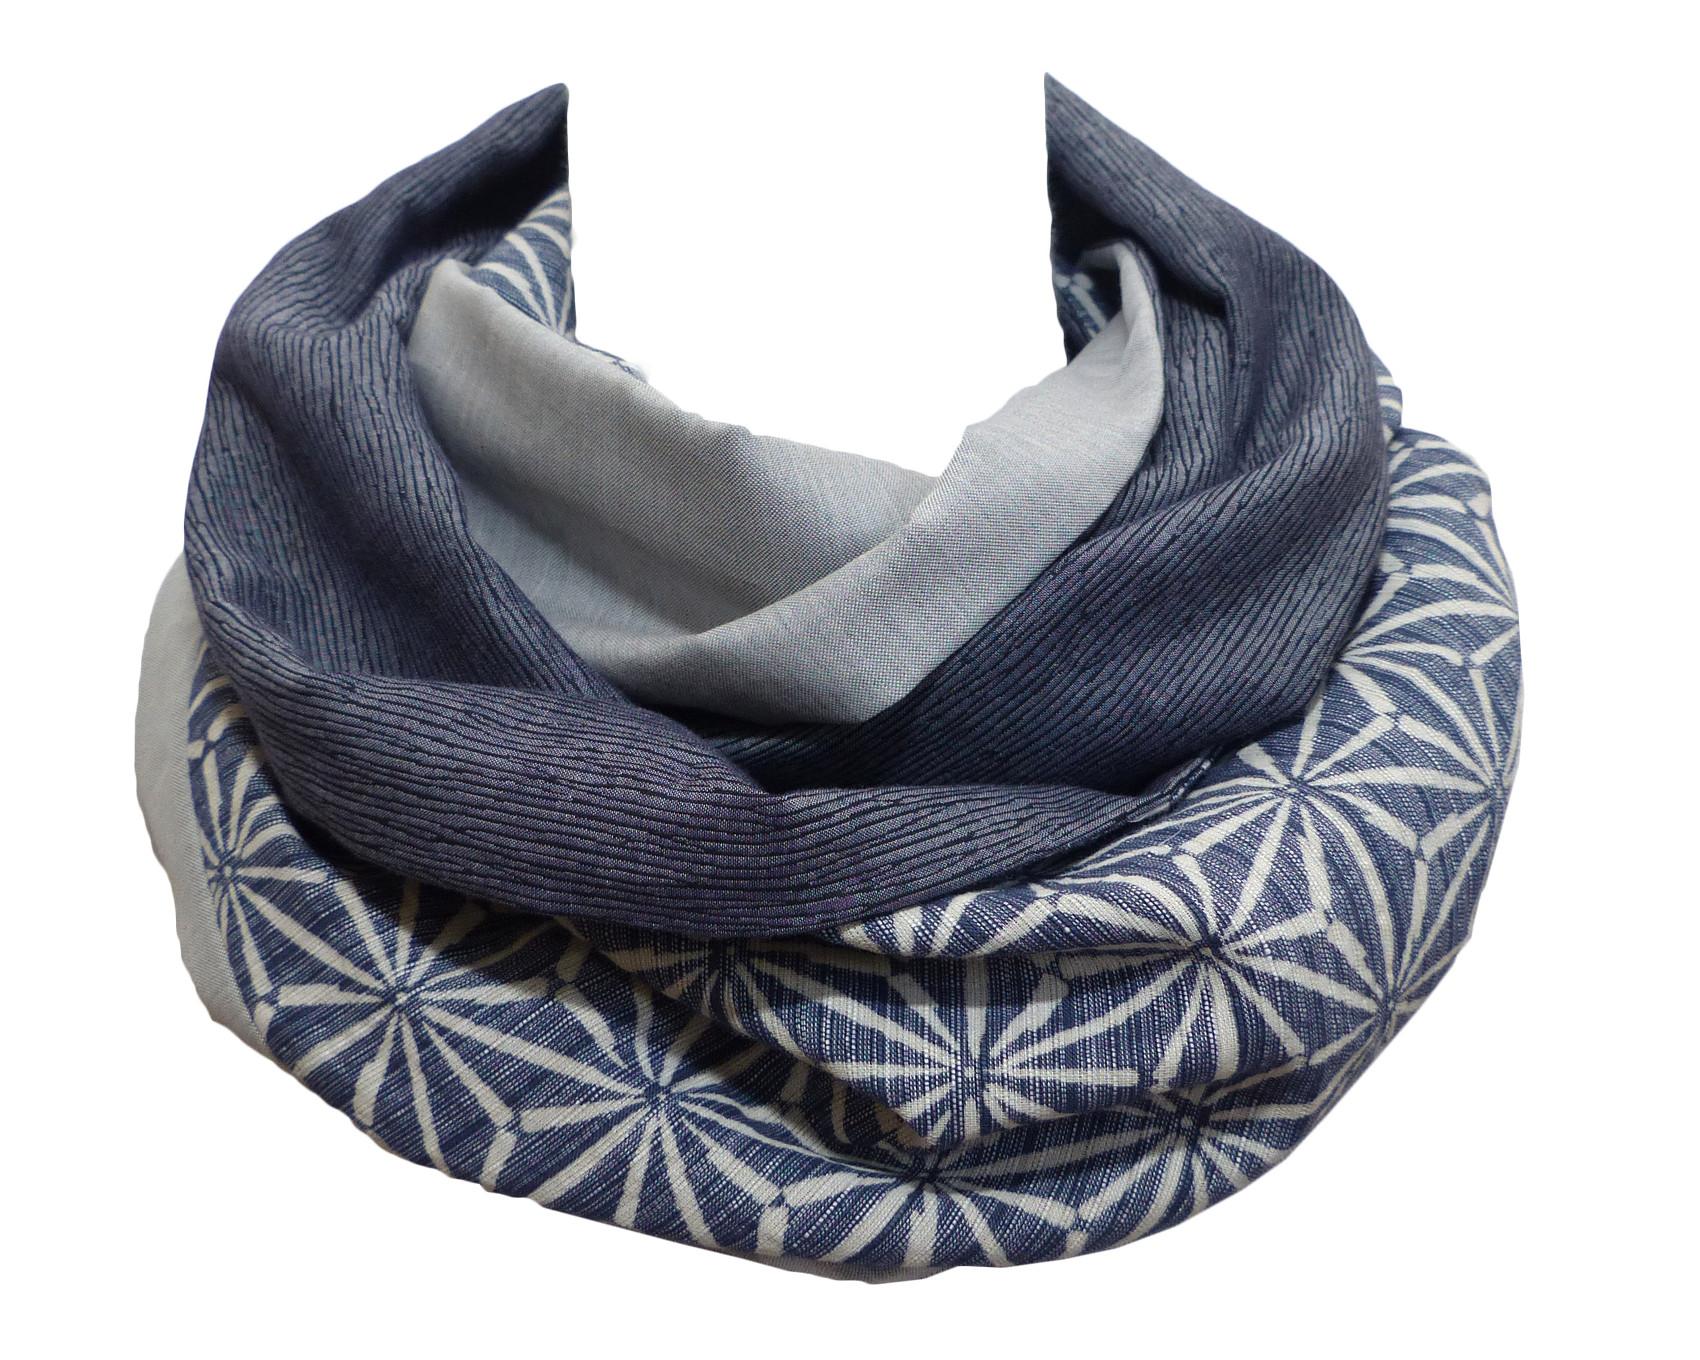 Echarpe Snood Bleu Gris, 2 Unis   Motif – Polina Couture 5f95b036fd5